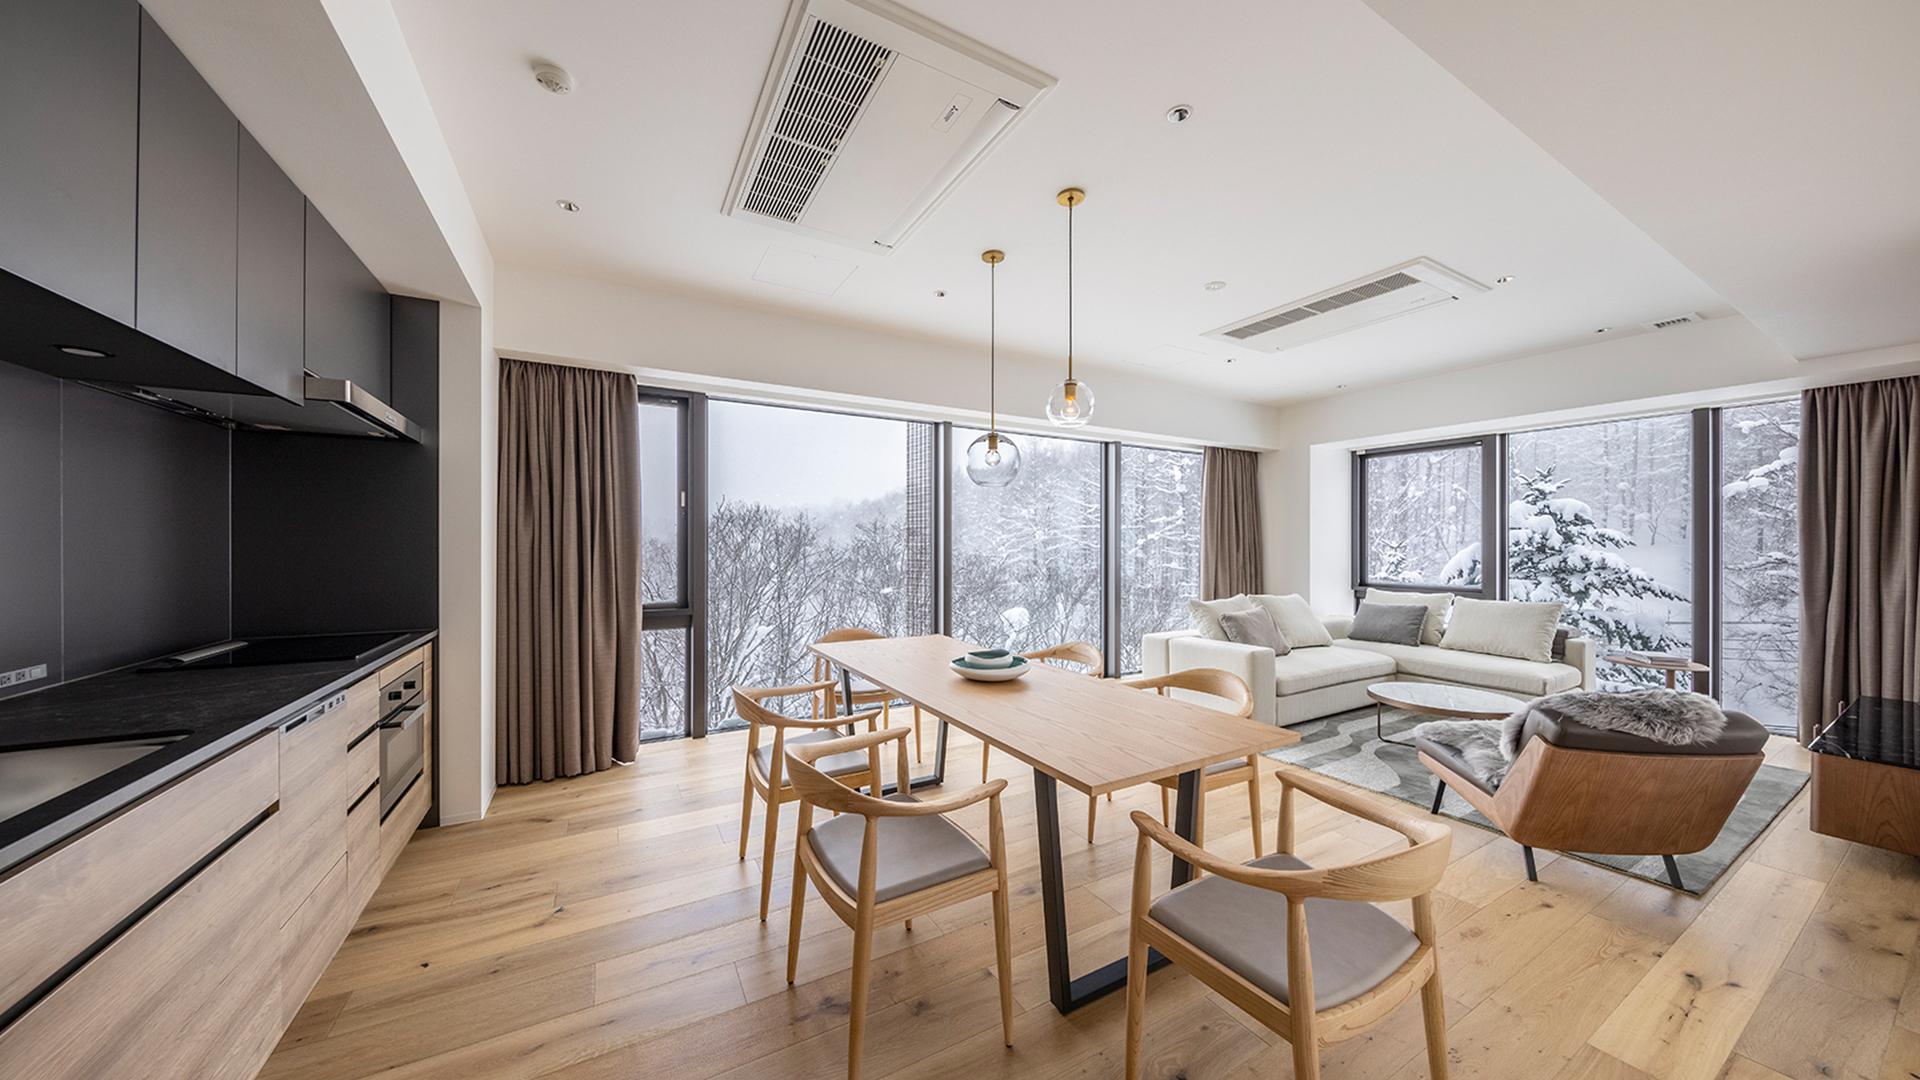 One-Bedroom Premier Apartment image 1 at Intuition Niseko by Abuta District, Hokkaido, Japan